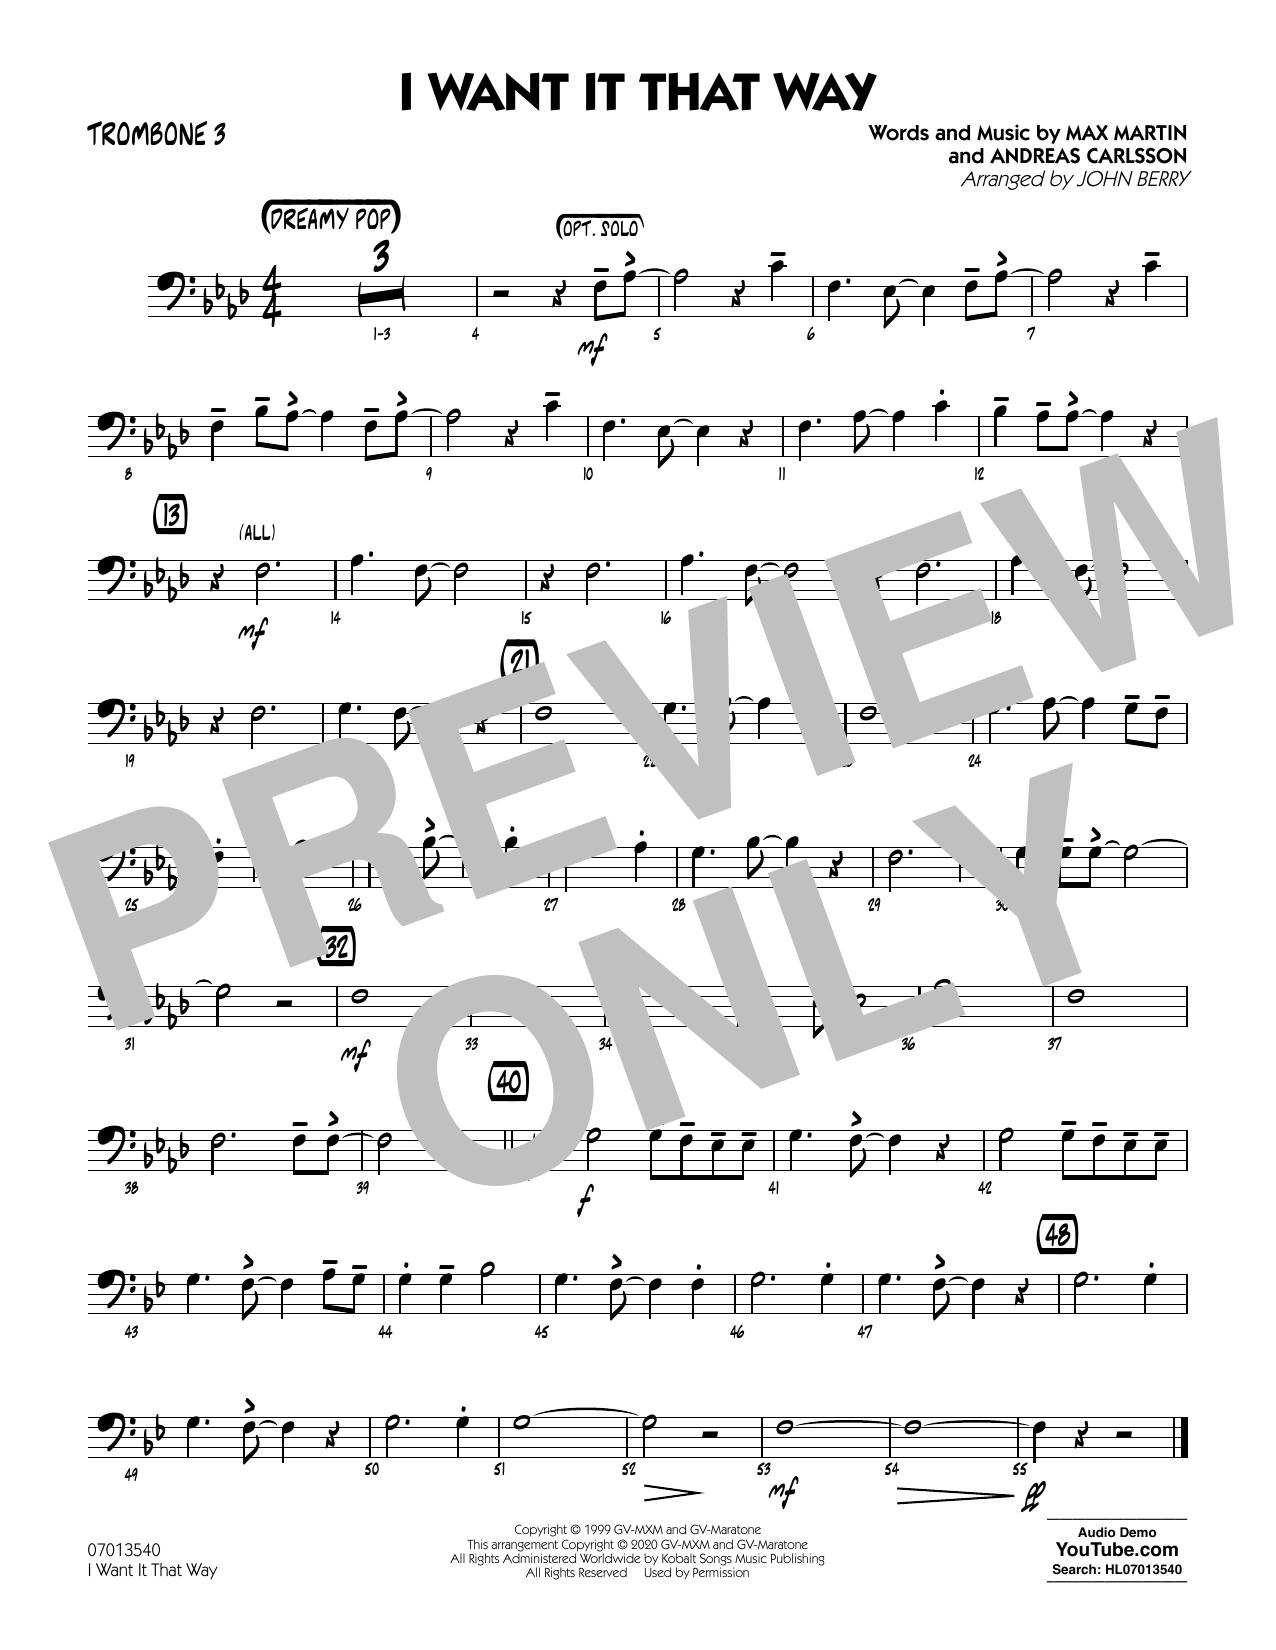 I Want It That Way (arr. John Berry) - Trombone 3 Sheet Music